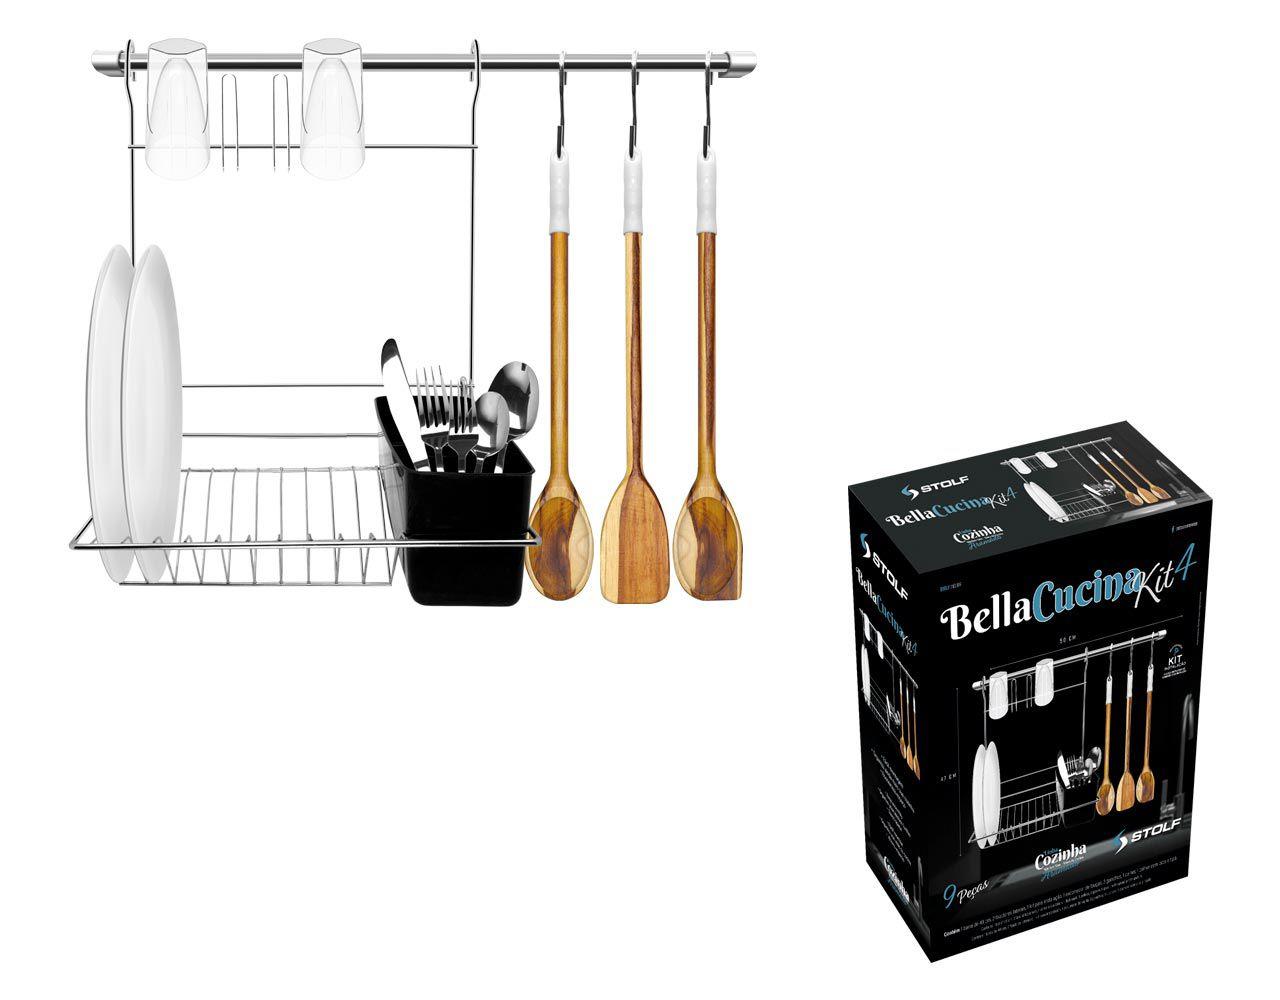 Bella Cucina Kit 4 Stolf